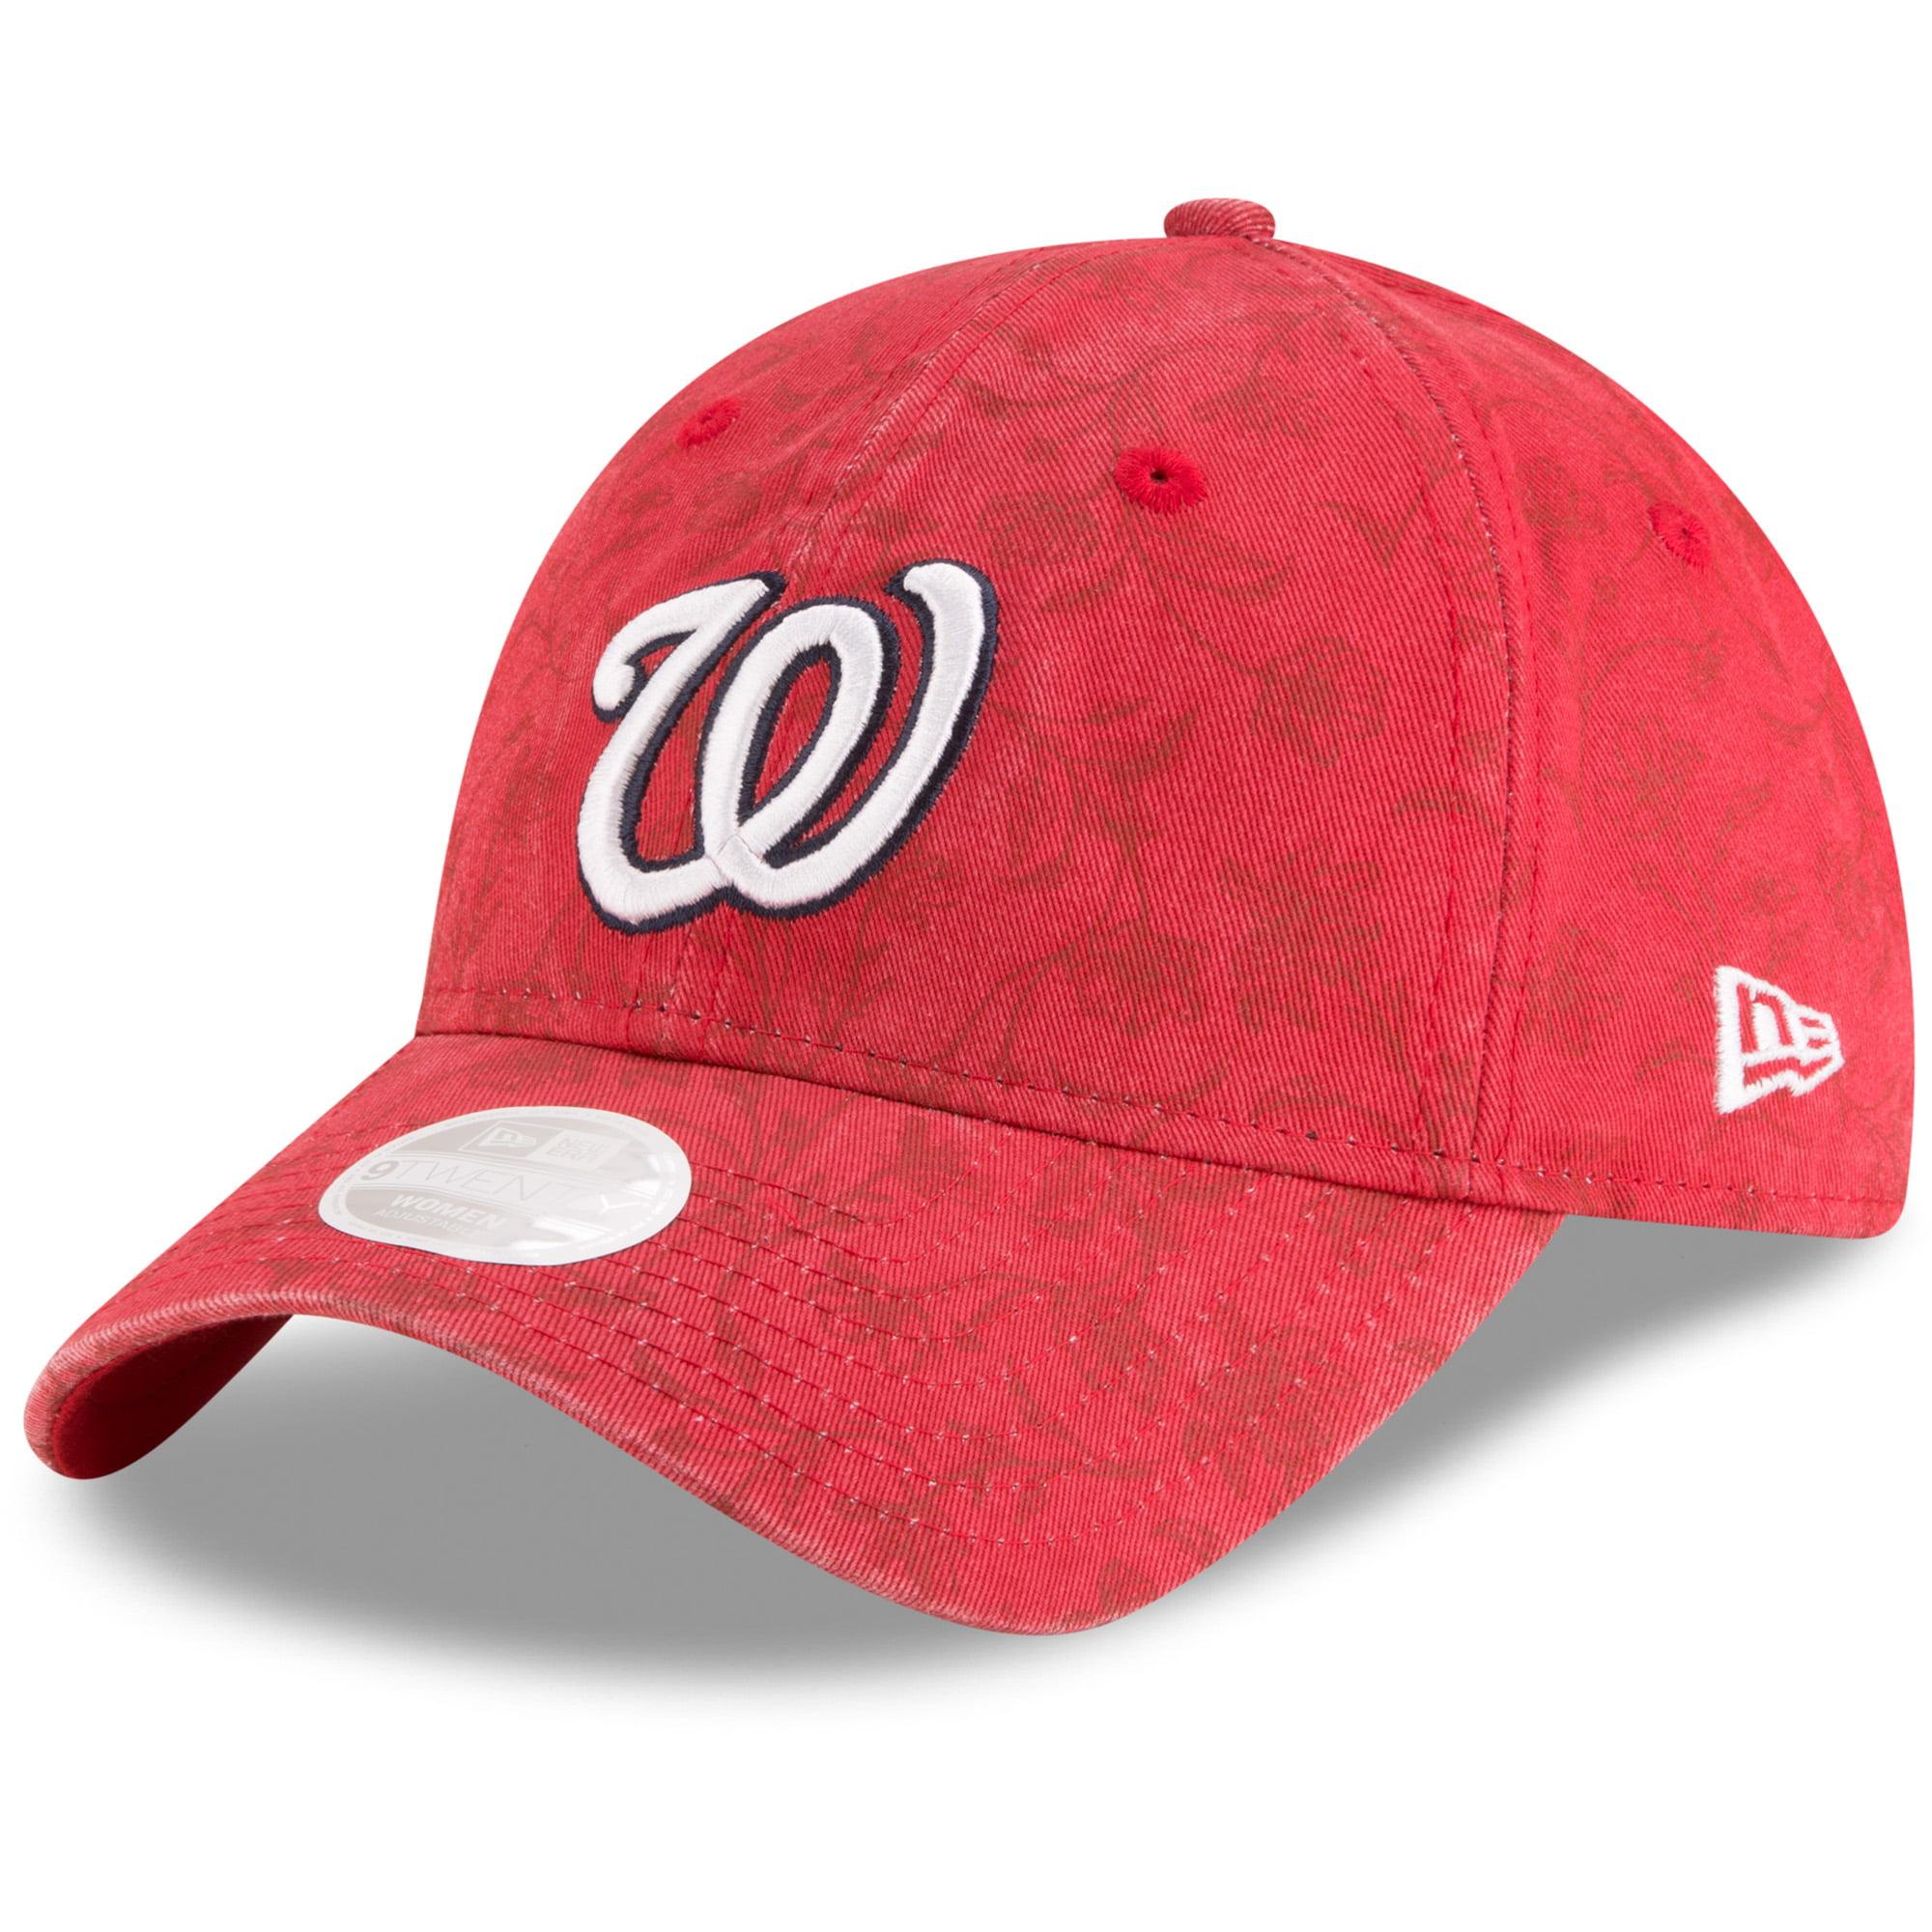 Washington Nationals New Era Women's Floral Peek 9TWENTY Adjustable Hat - Red - OSFA